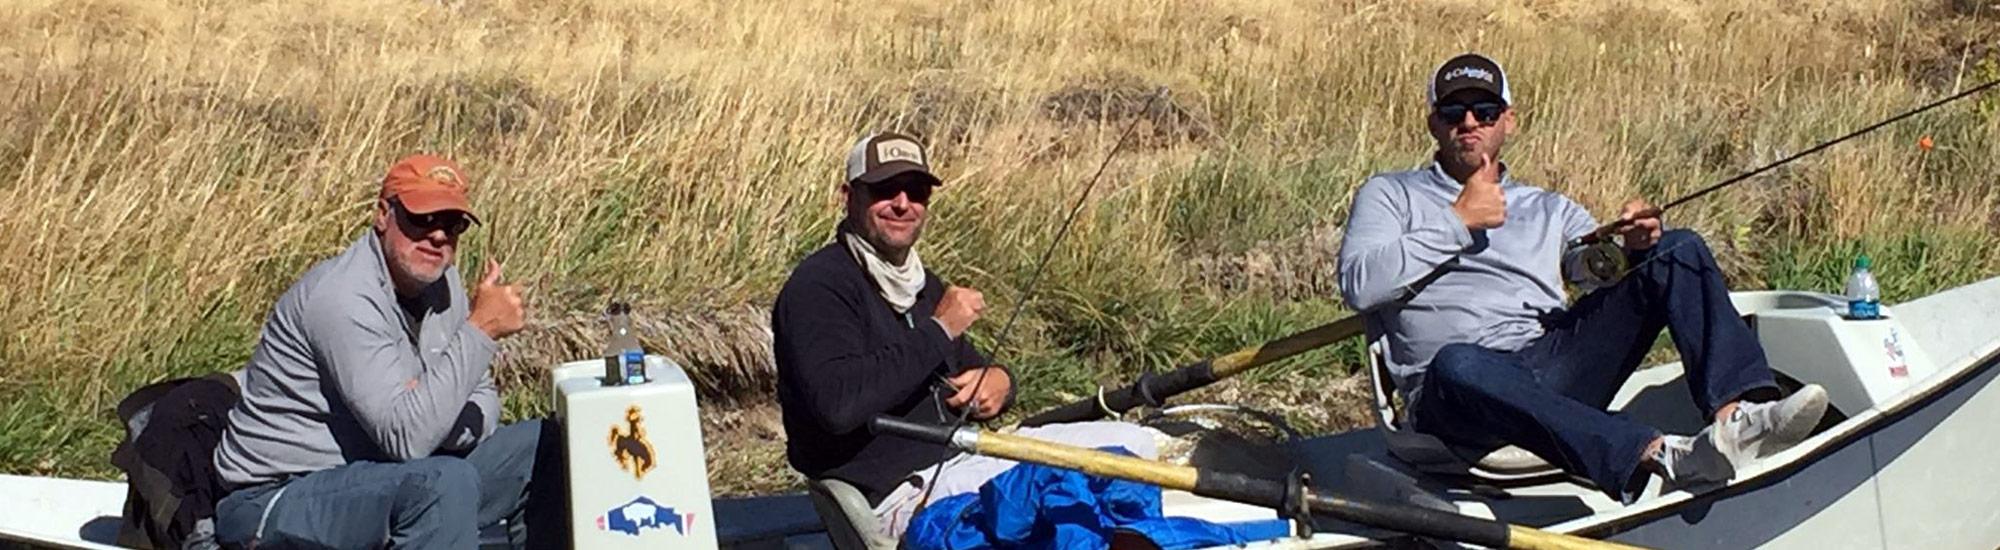 banner_image_corporate_fishing